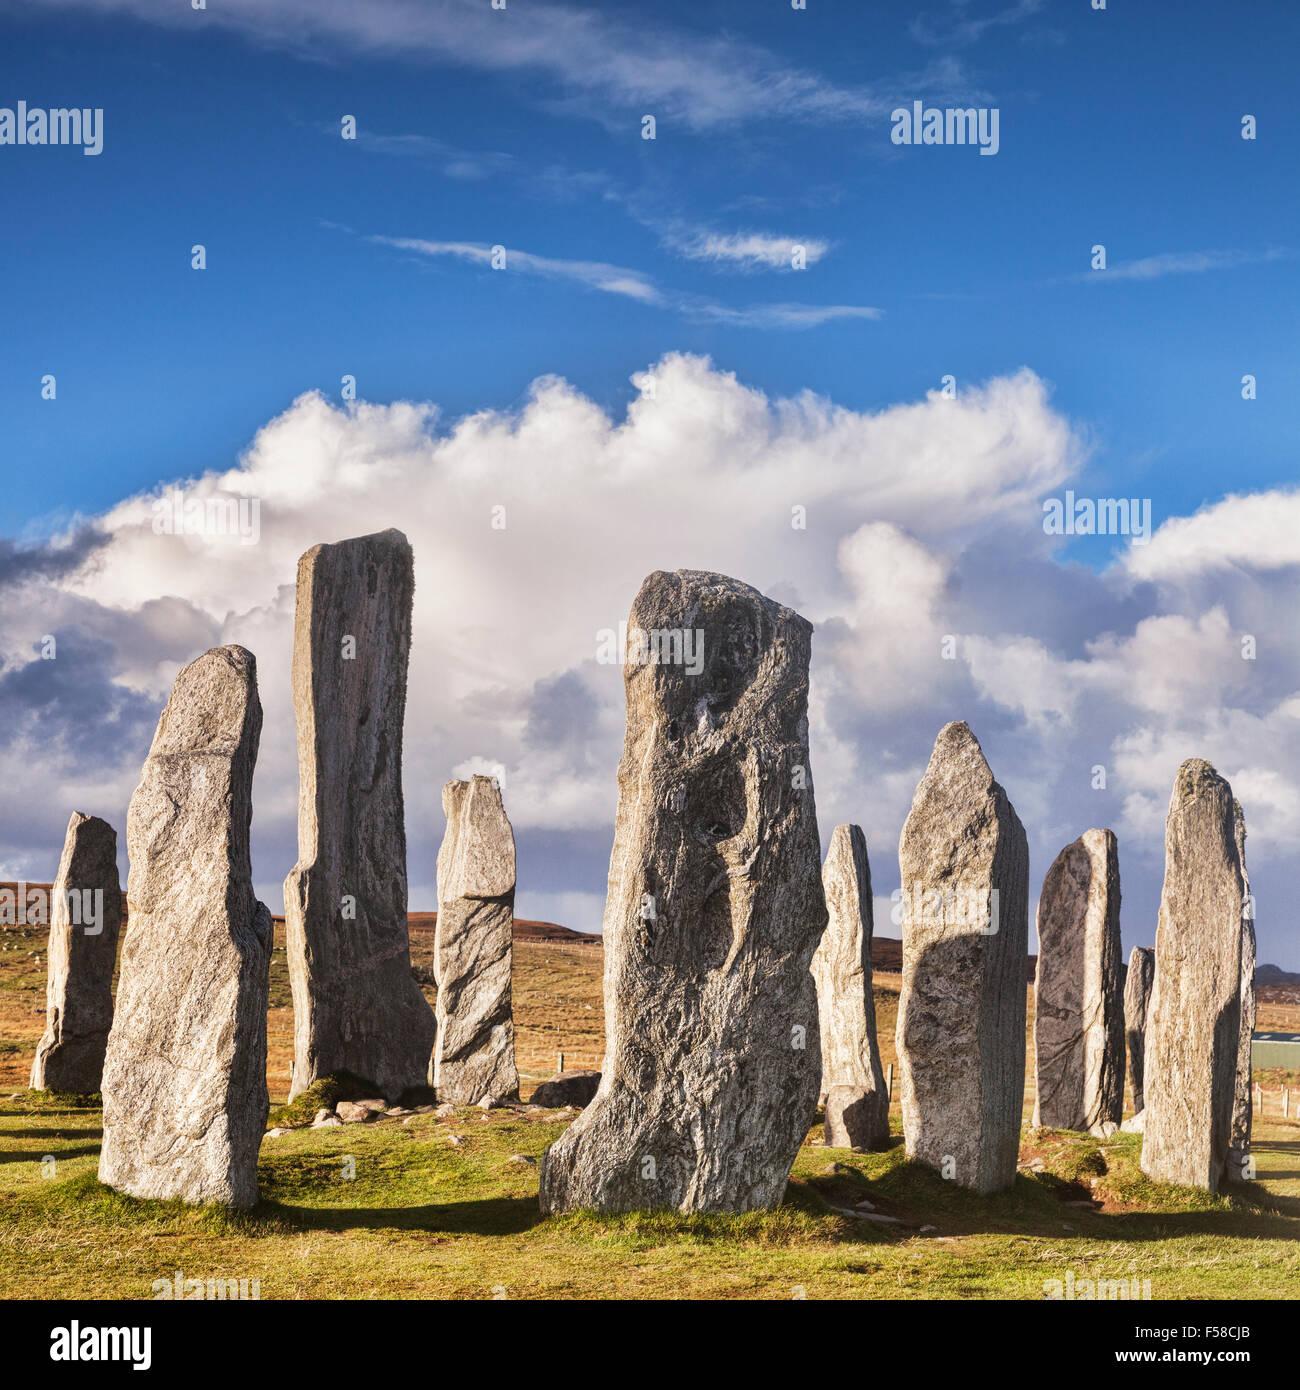 Stone Circle à Callanish, Isle Of Lewis, Western Isles, îles Hébrides, Ecosse, Royaume-Uni Banque D'Images